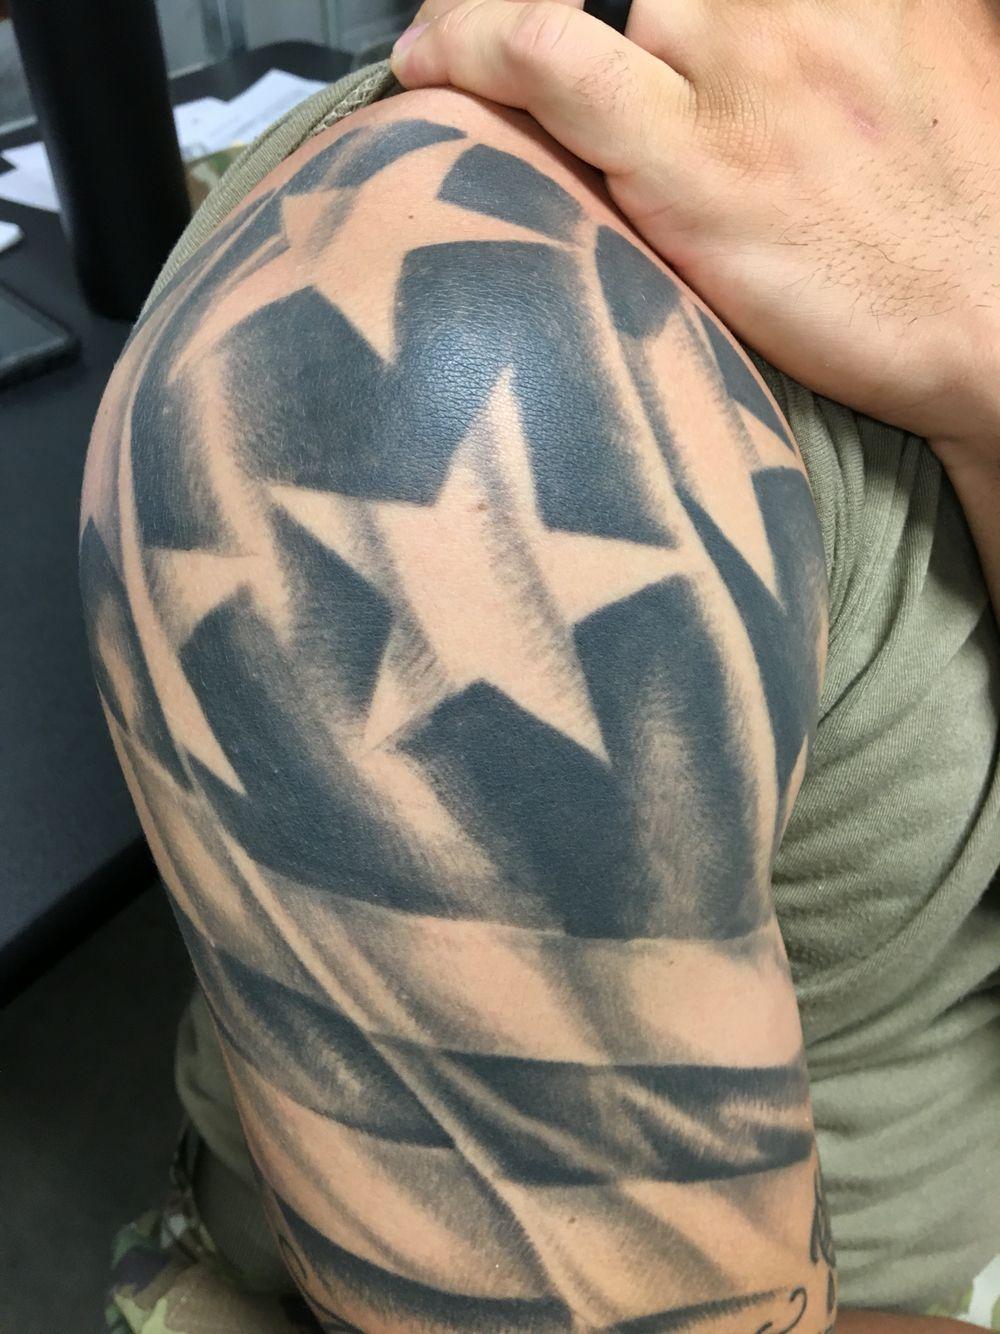 Pin By Paul Woodward On Maybe Tattoo Sleeve Designs Flag Tattoo Usa Tattoo